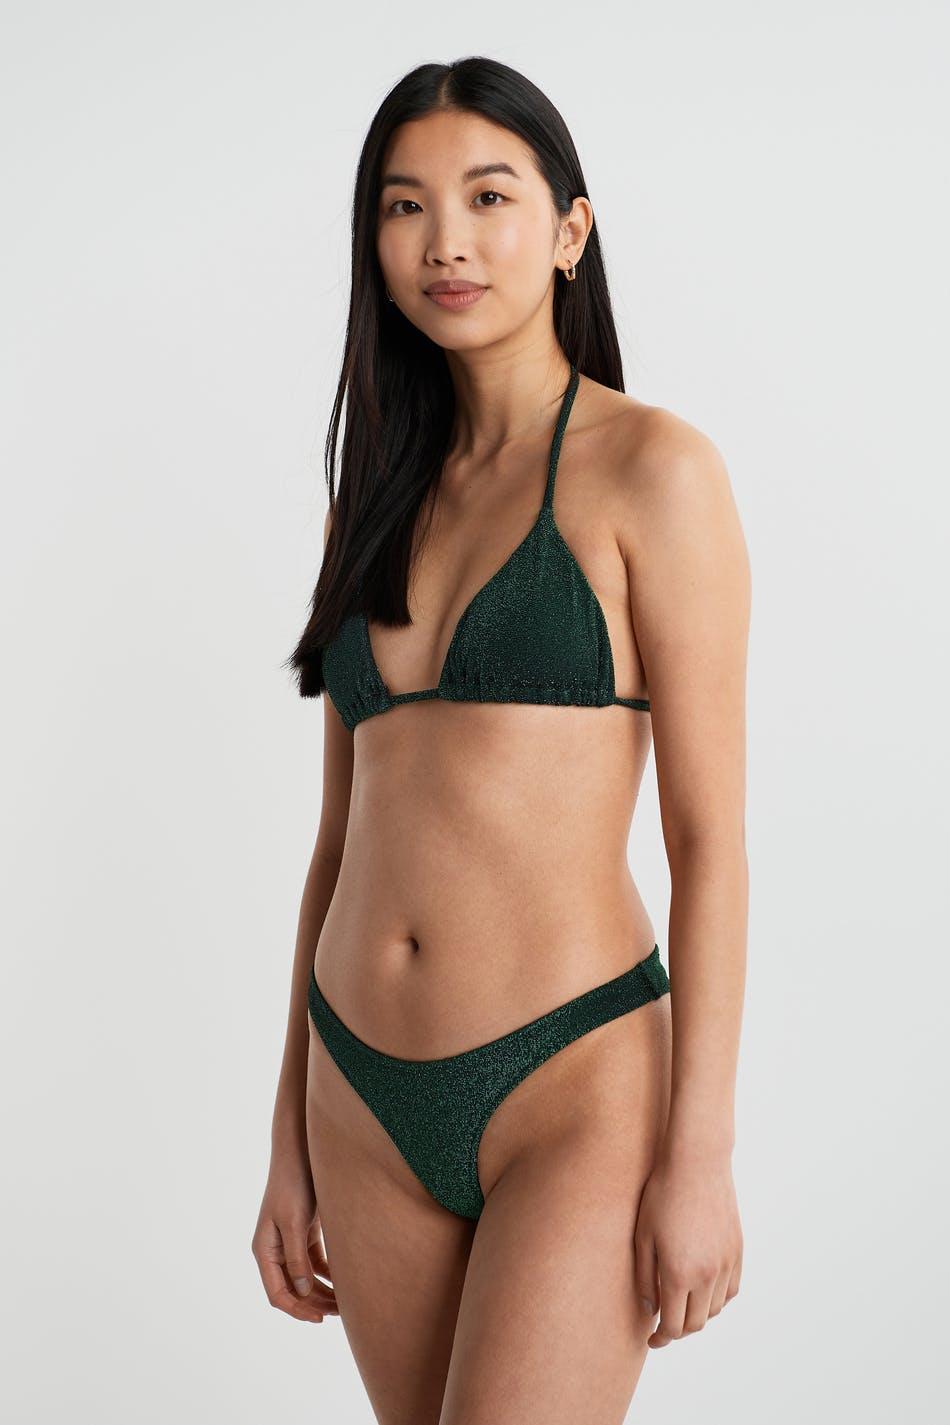 Gina Tricot Valerie bikini brief XL Female Jane bug (6066)